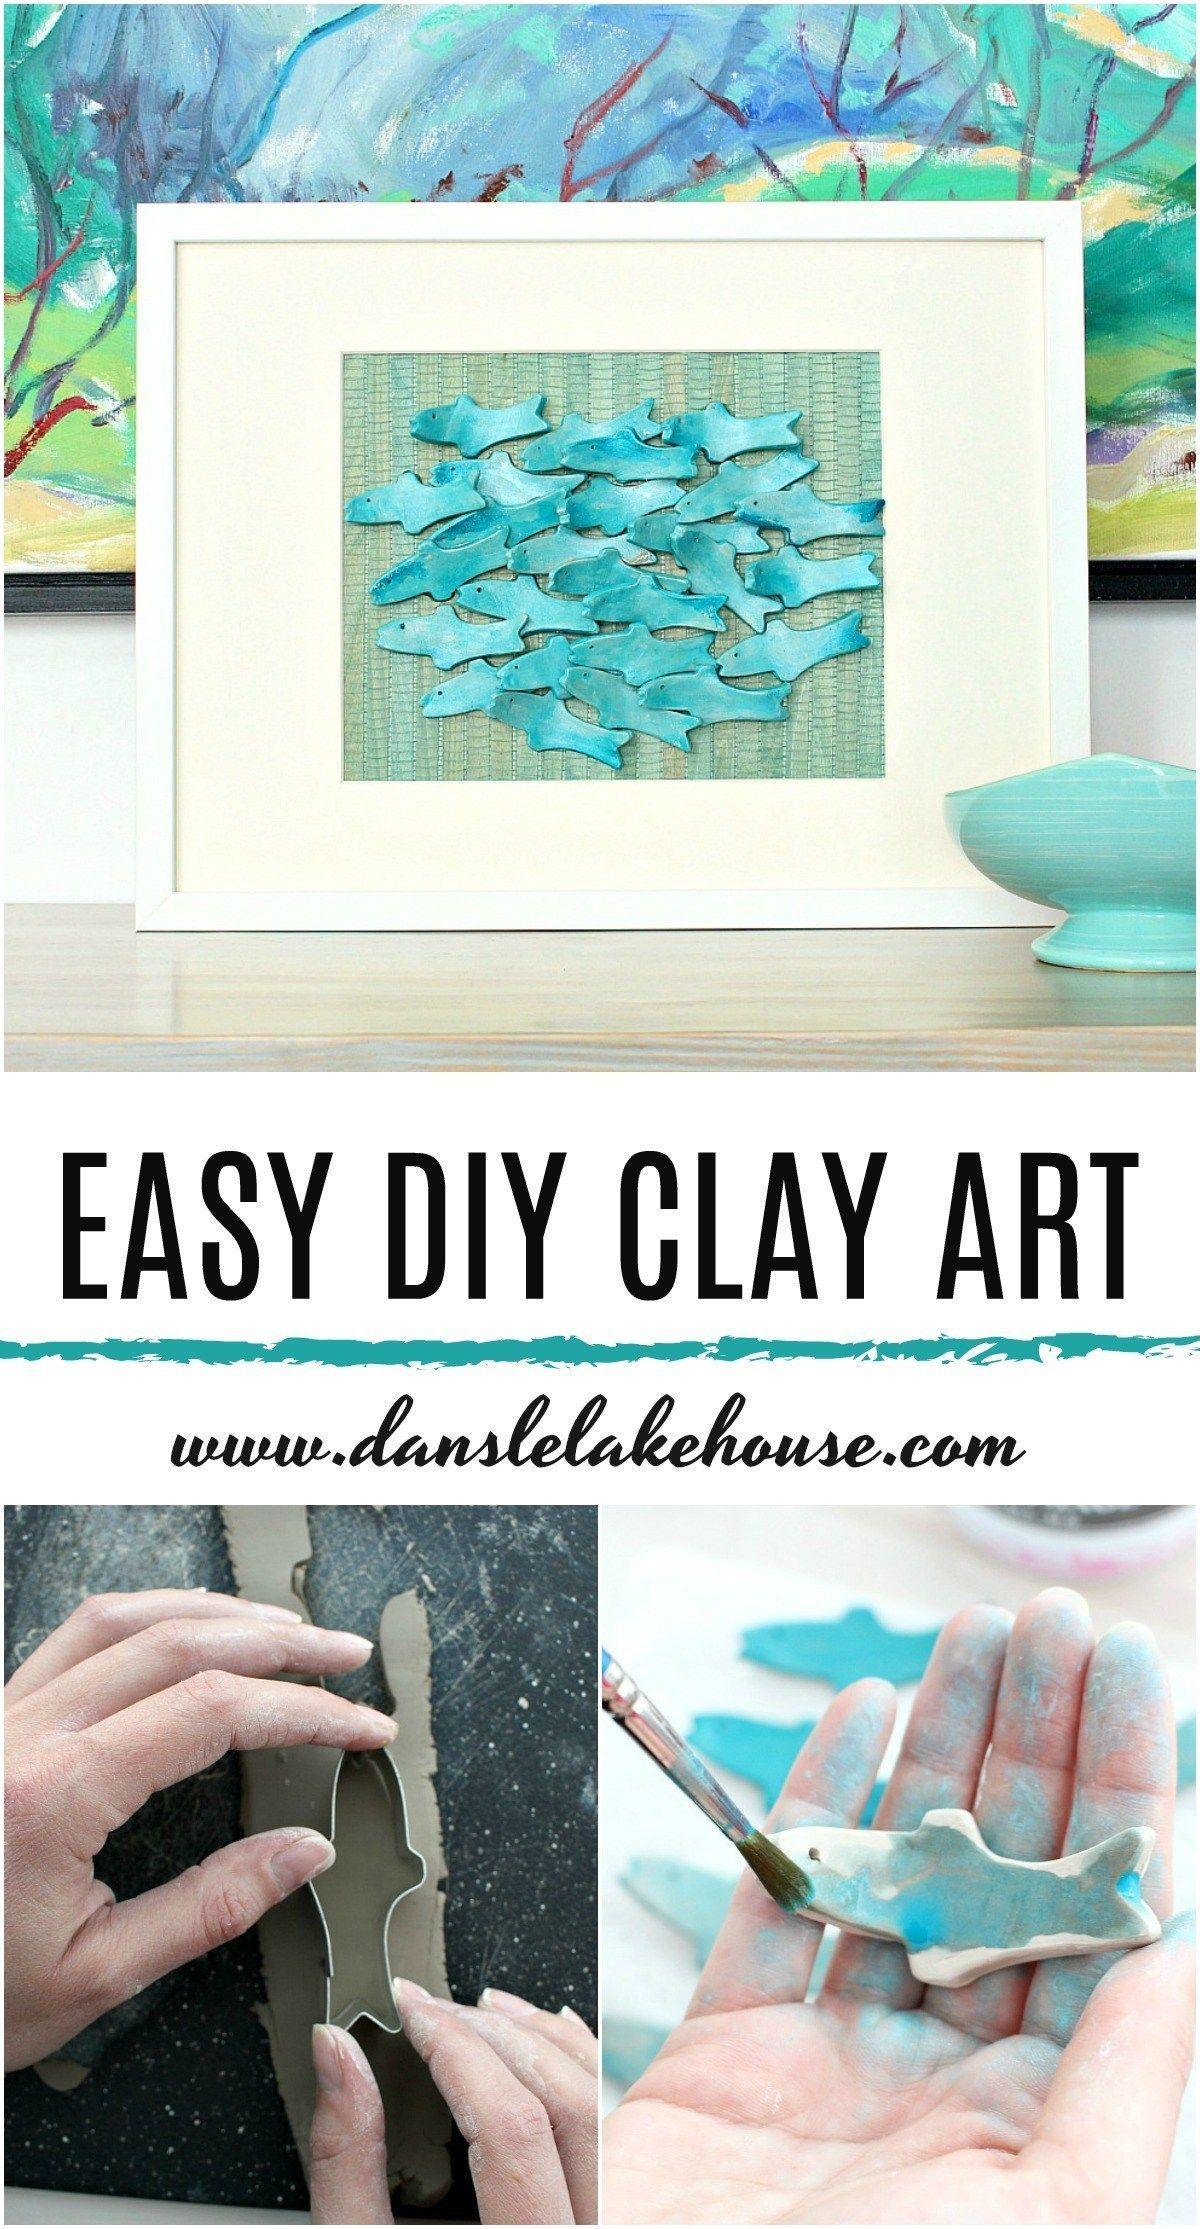 Easy DIY Clay Fish Art – Modern Coastal Handmade Decor – Hobbies paining body for kids and adult